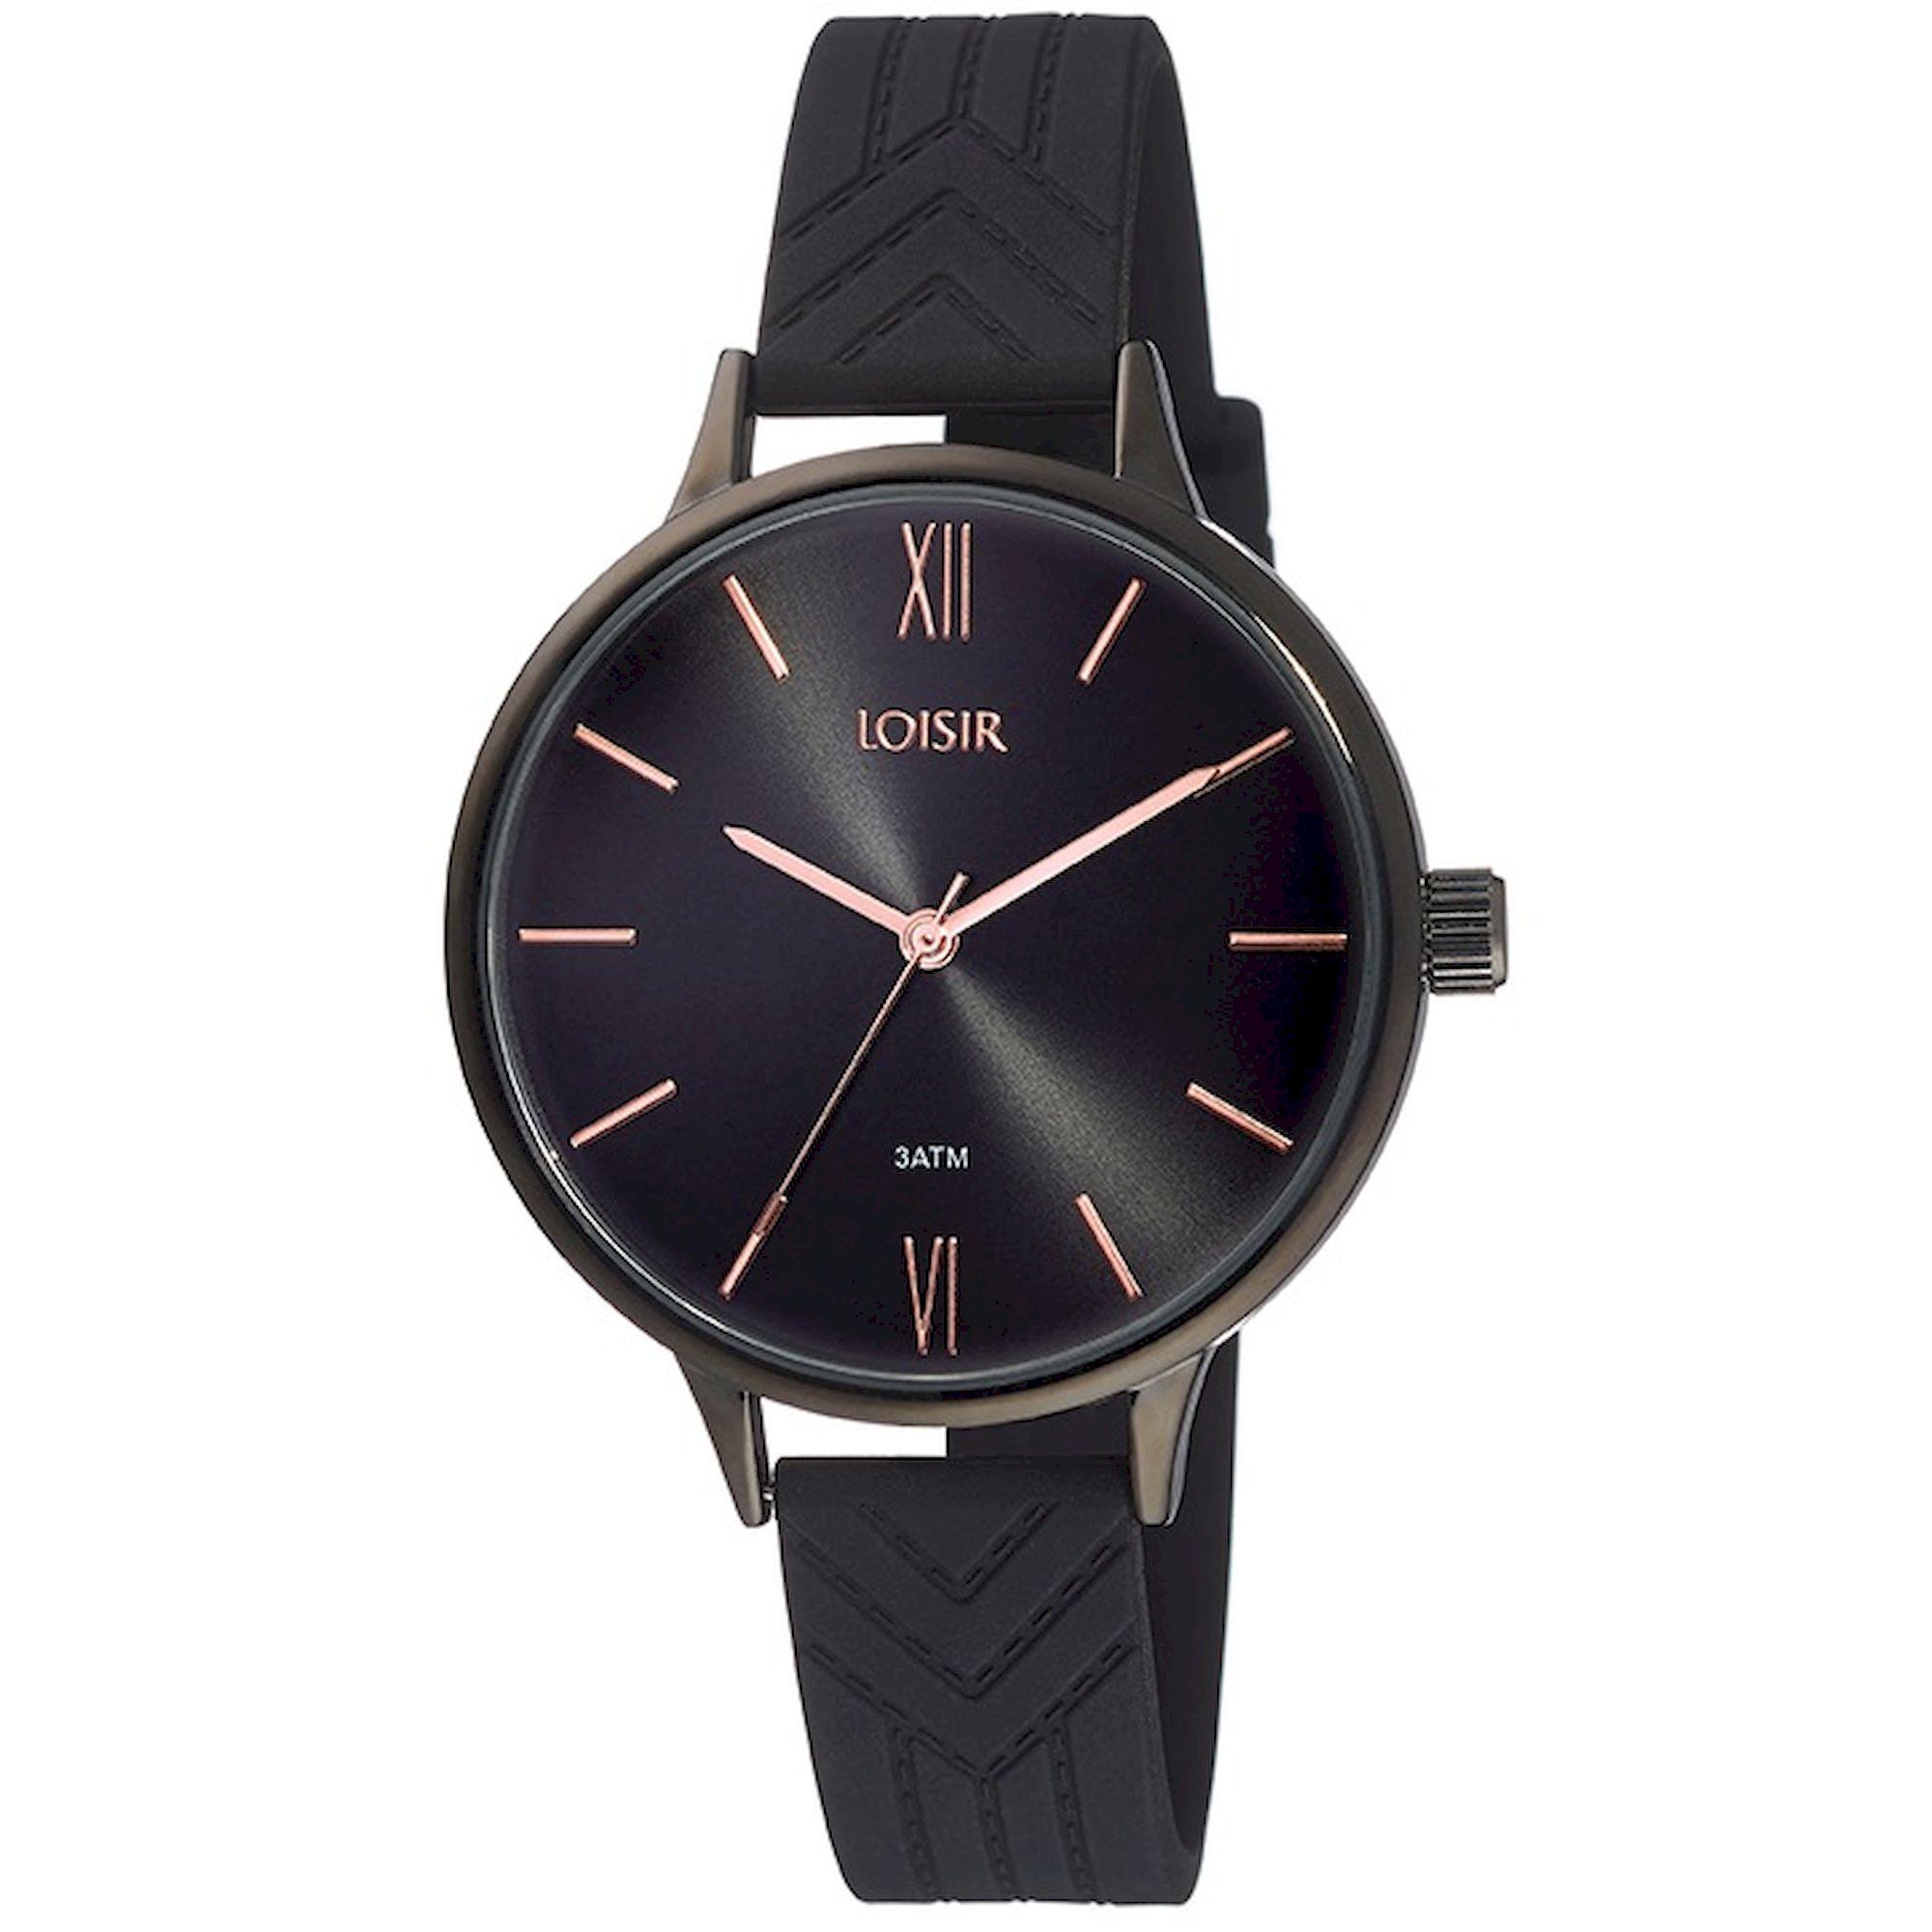 Loisir Ρολόι Paradise Μαύρο Καντράν 11L75-00295, γυναικείο ρολόι, ρολόι loisir, loisir , Δωρεάν έξοδα αποστολής, Αμεση Διαθεσιμότητα, λοισιρ γυναικεία ρολόγια